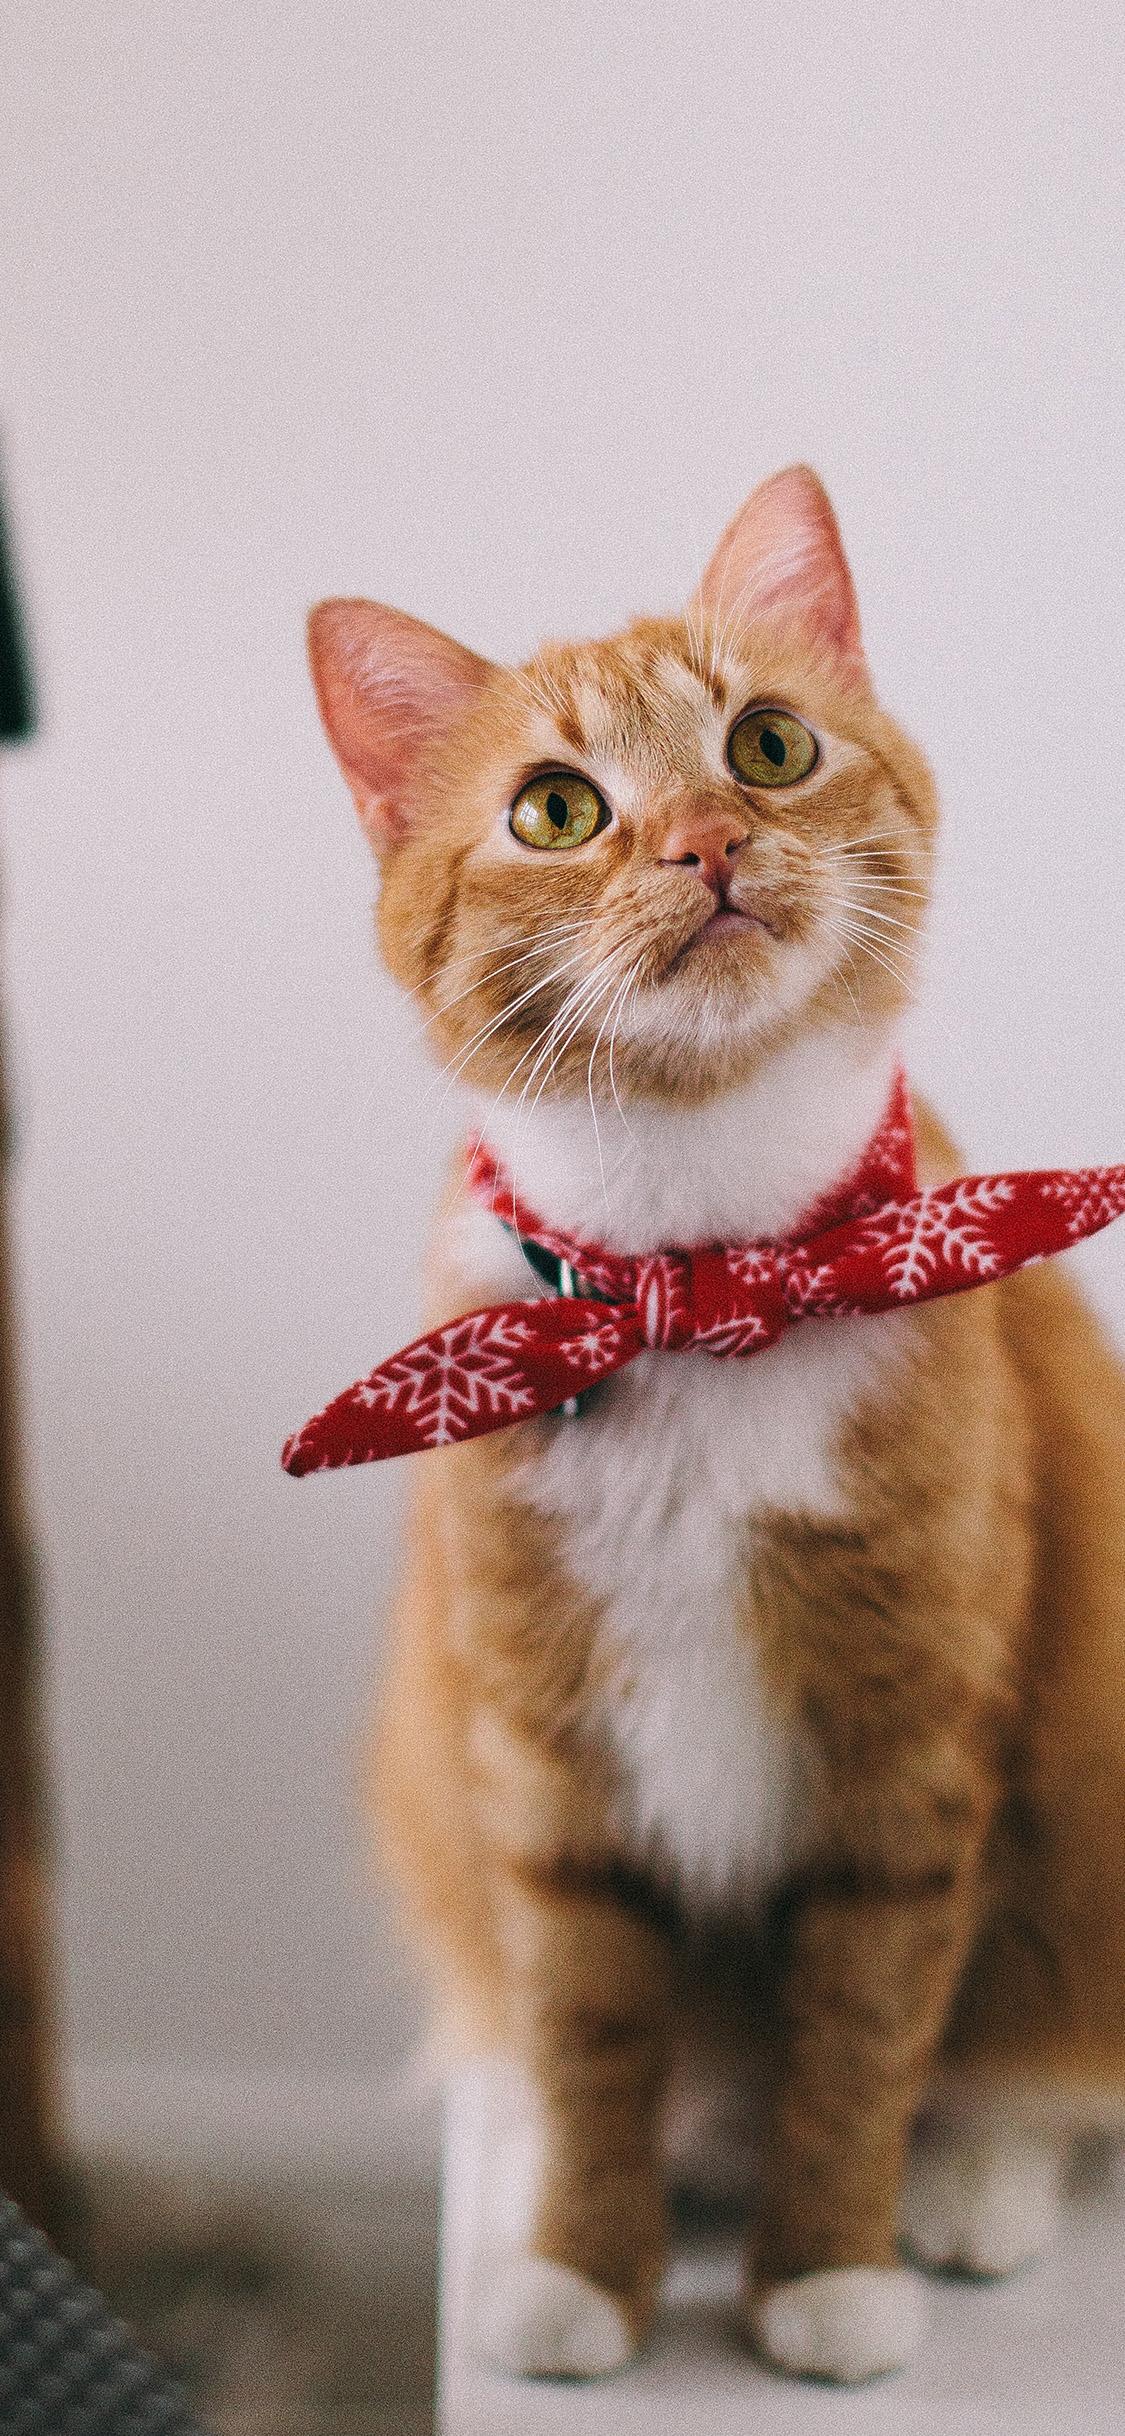 iPhonexpapers.com-Apple-iPhone-wallpaper-oc69-cat-cute-animal-nature